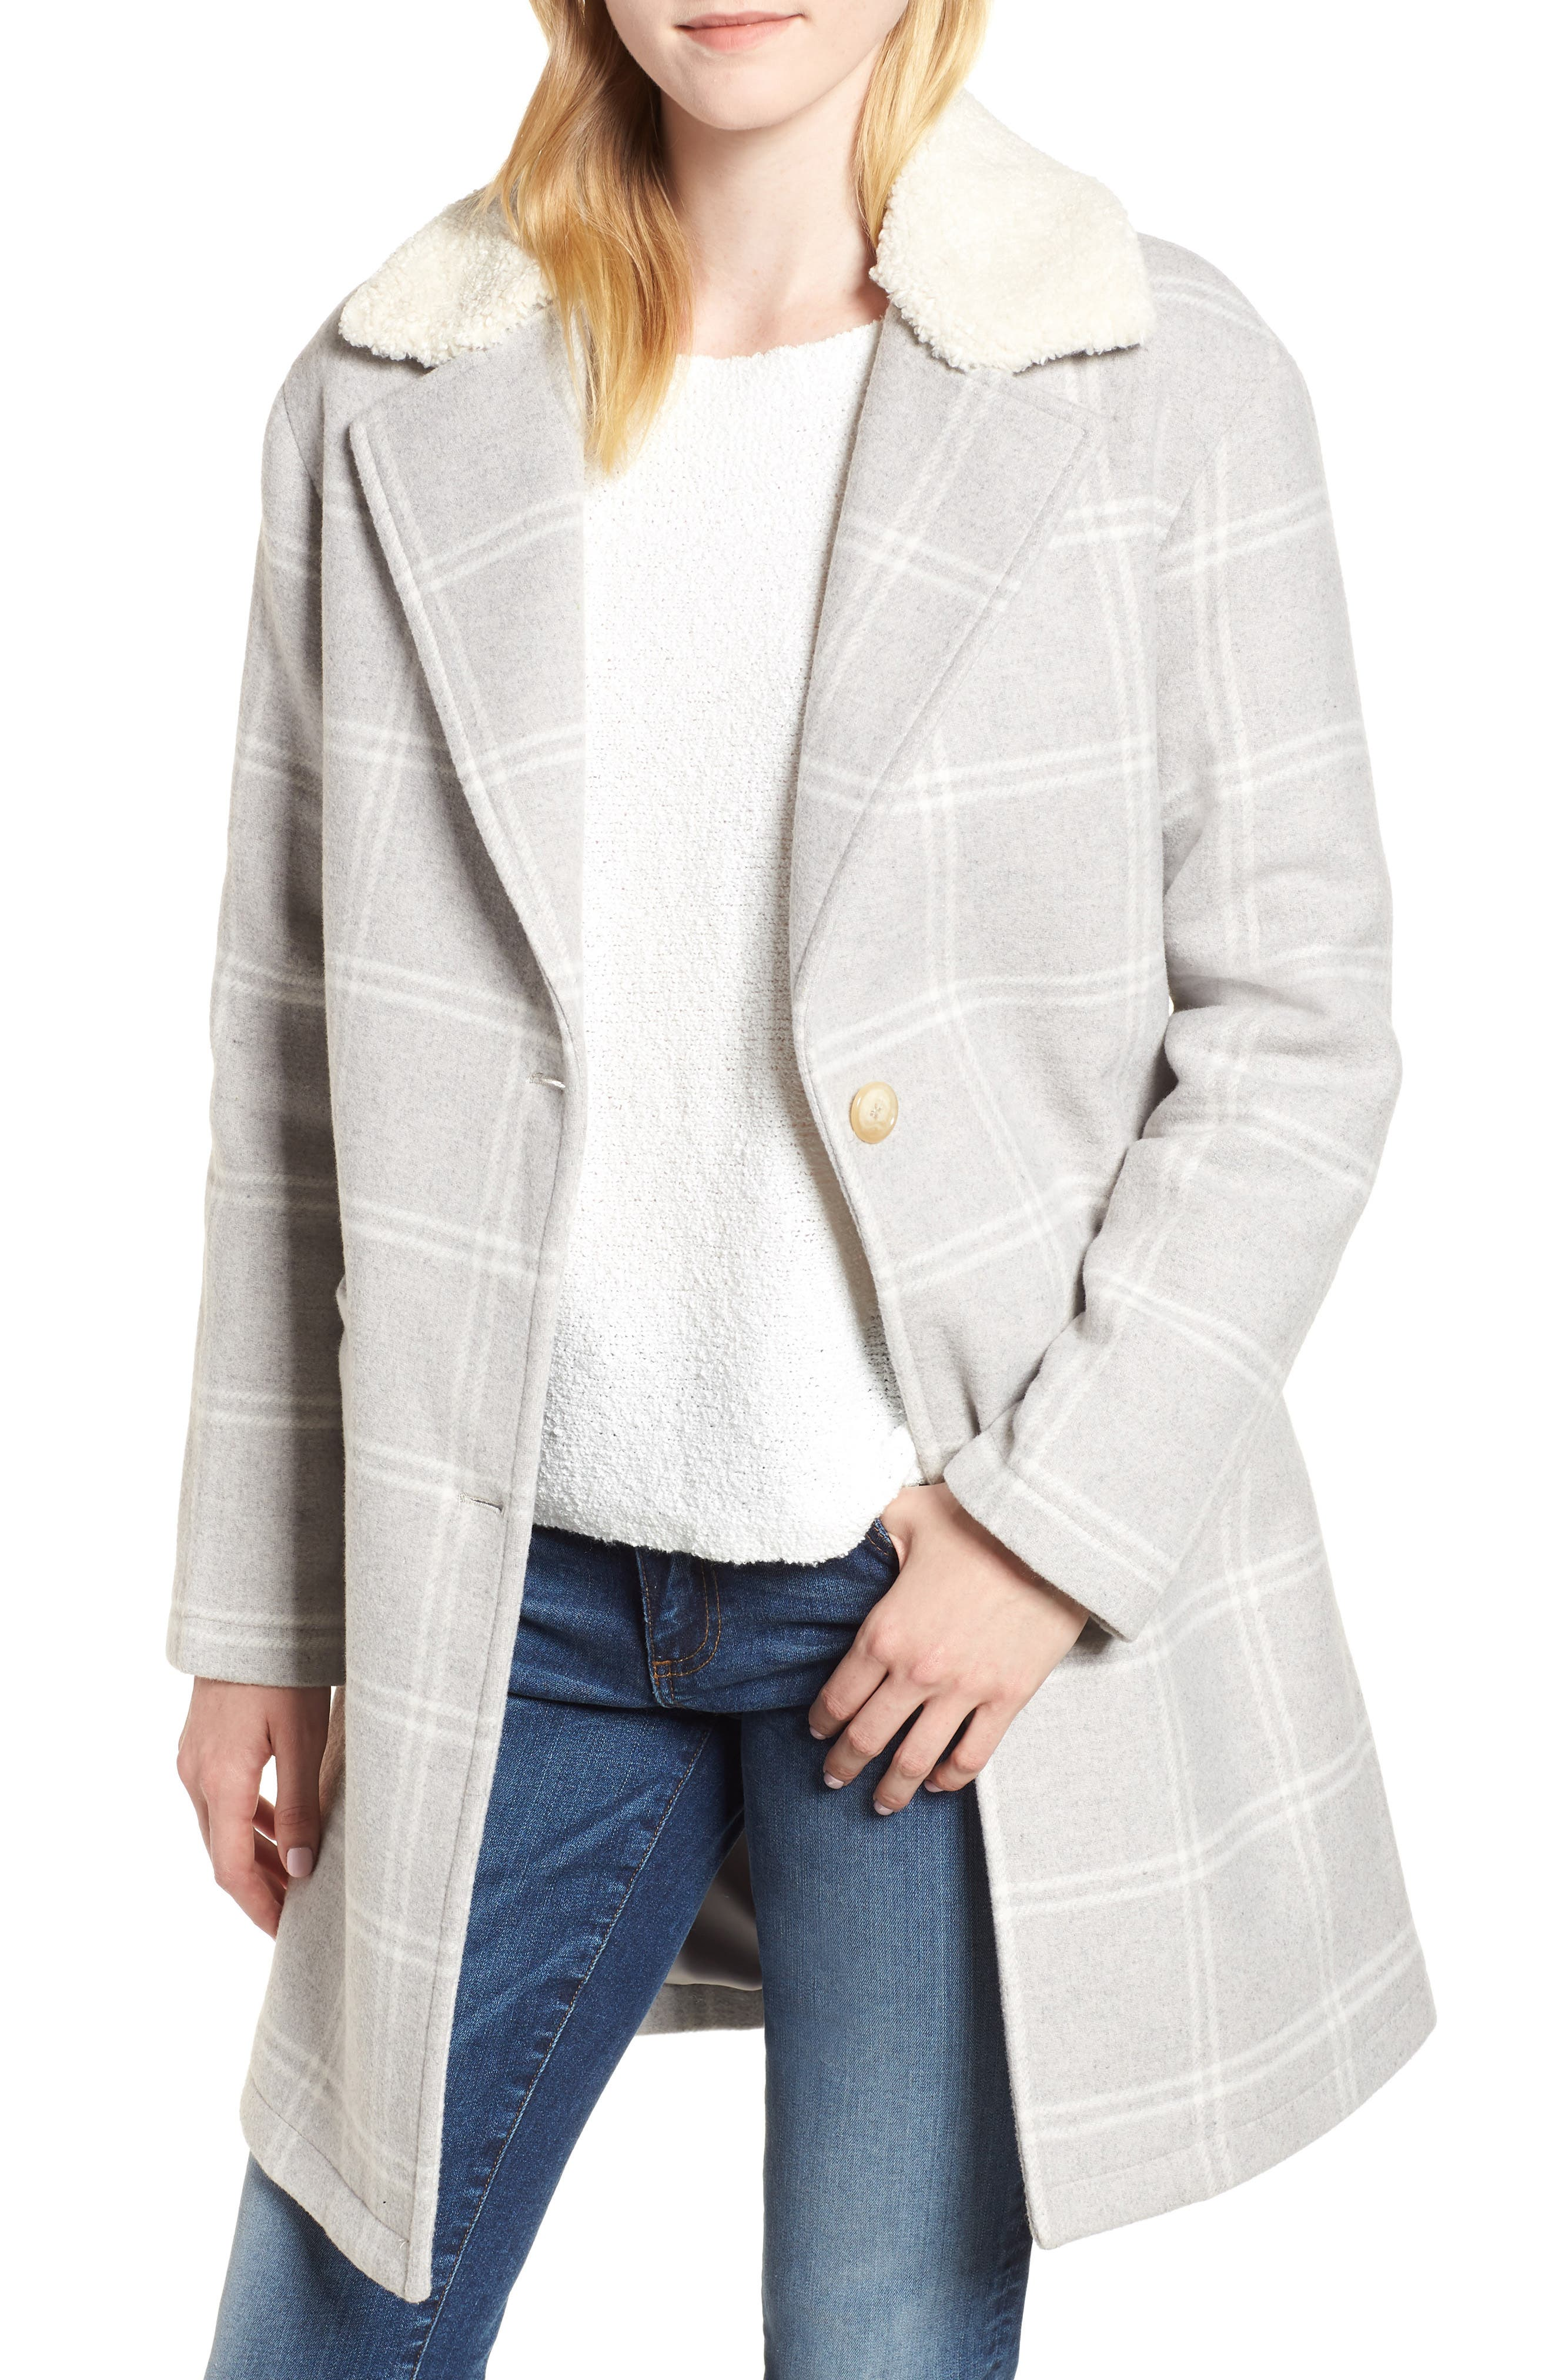 Wool Top Coat,                             Main thumbnail 1, color,                             GREY PLAID WOOL